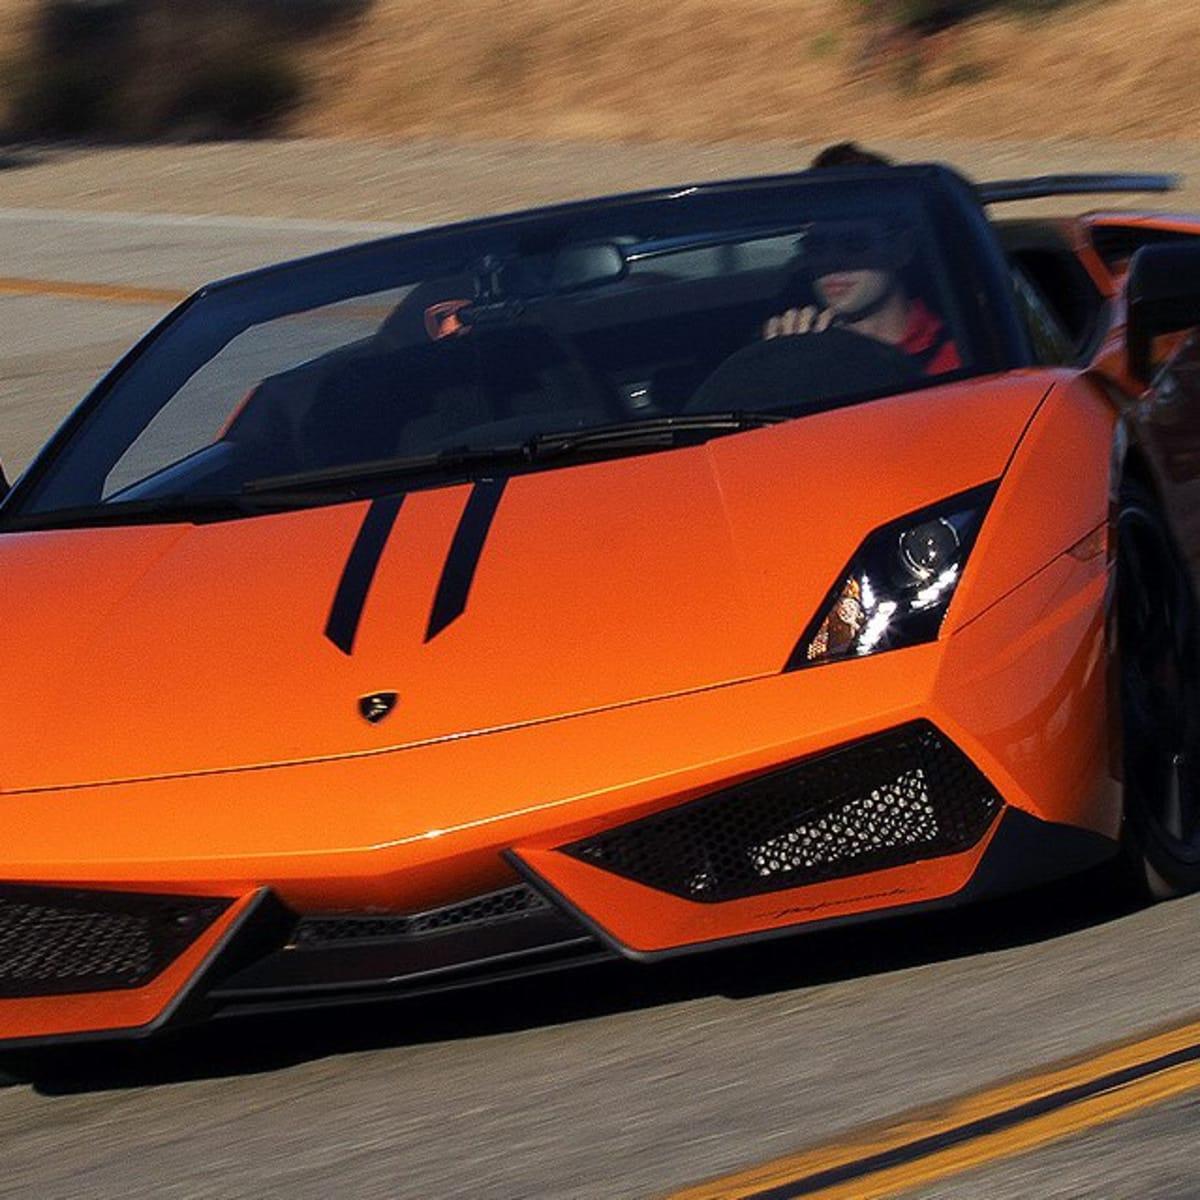 Lamborghini Gallardo Lp 570 4 Spyder Performante Review Caradvice